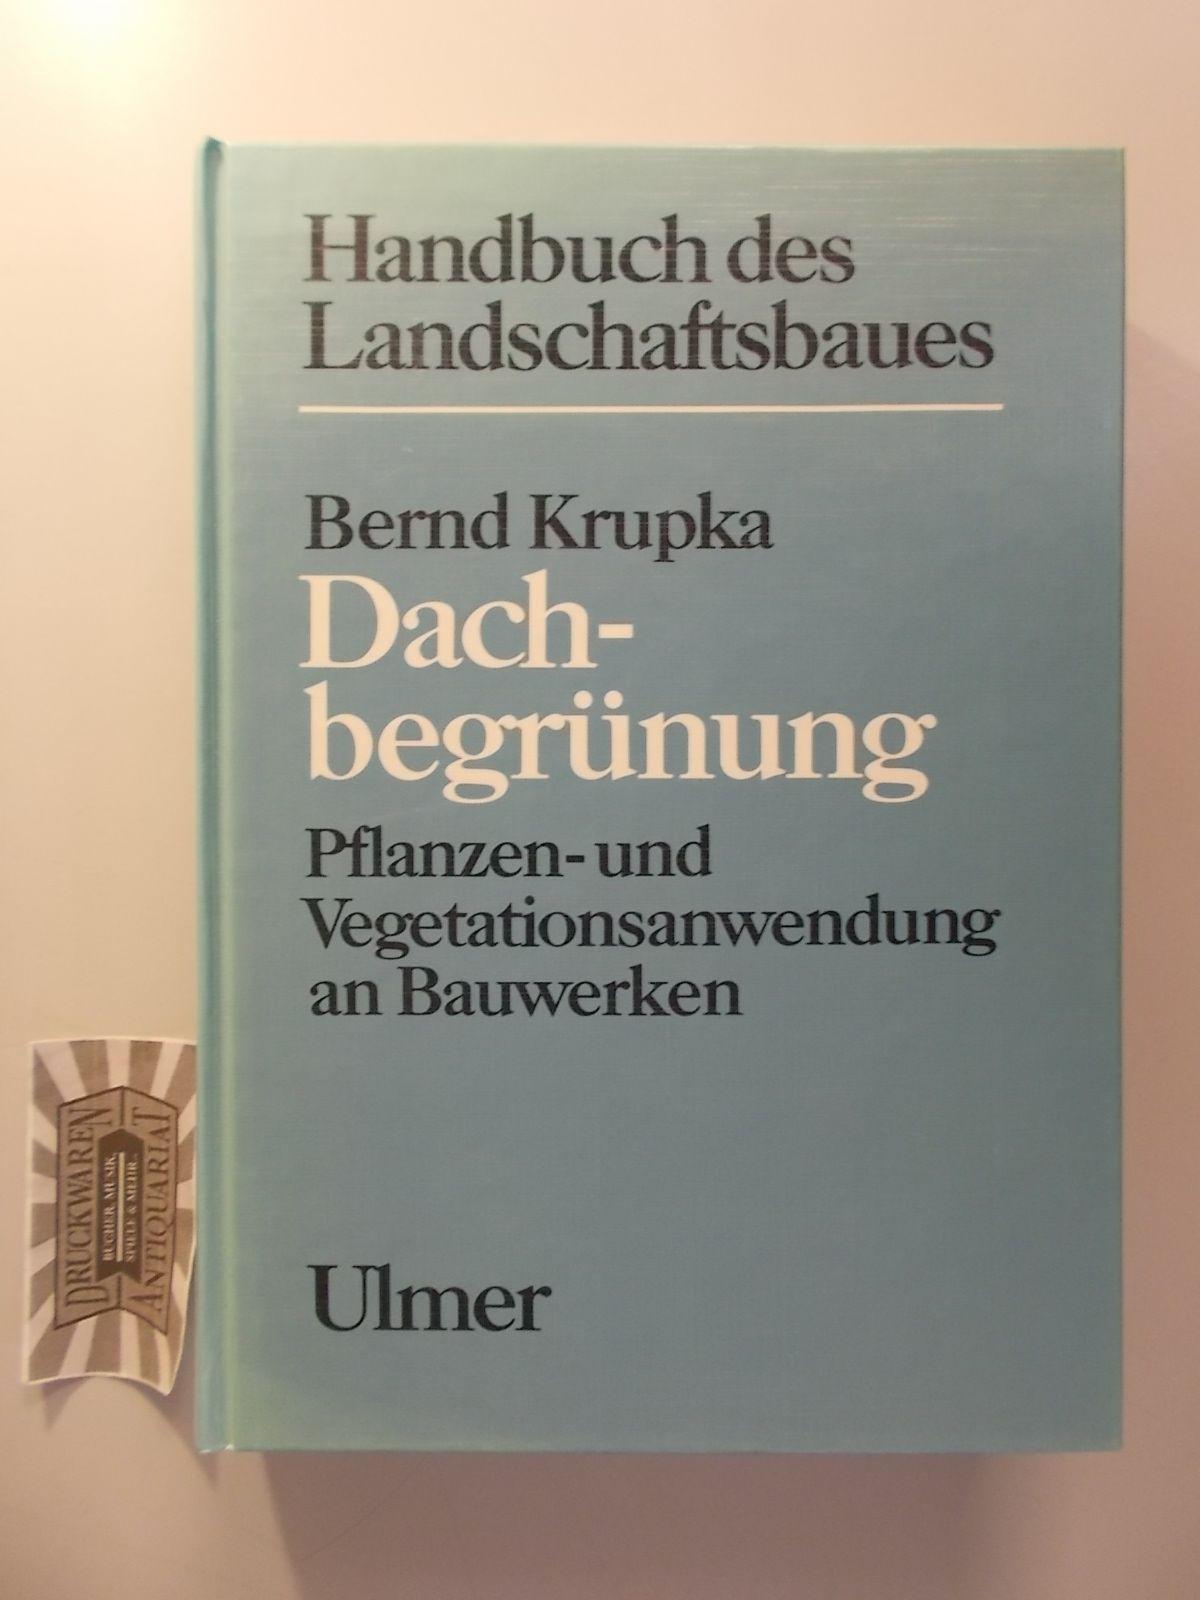 Dachbegrünung : Pflanzen- und Vegetationsanwendung an Bauwerken - 217 Abbildungen - 64 Farbfotos - 91 Tabellen. (Handbuch des Landschaftsbaues).